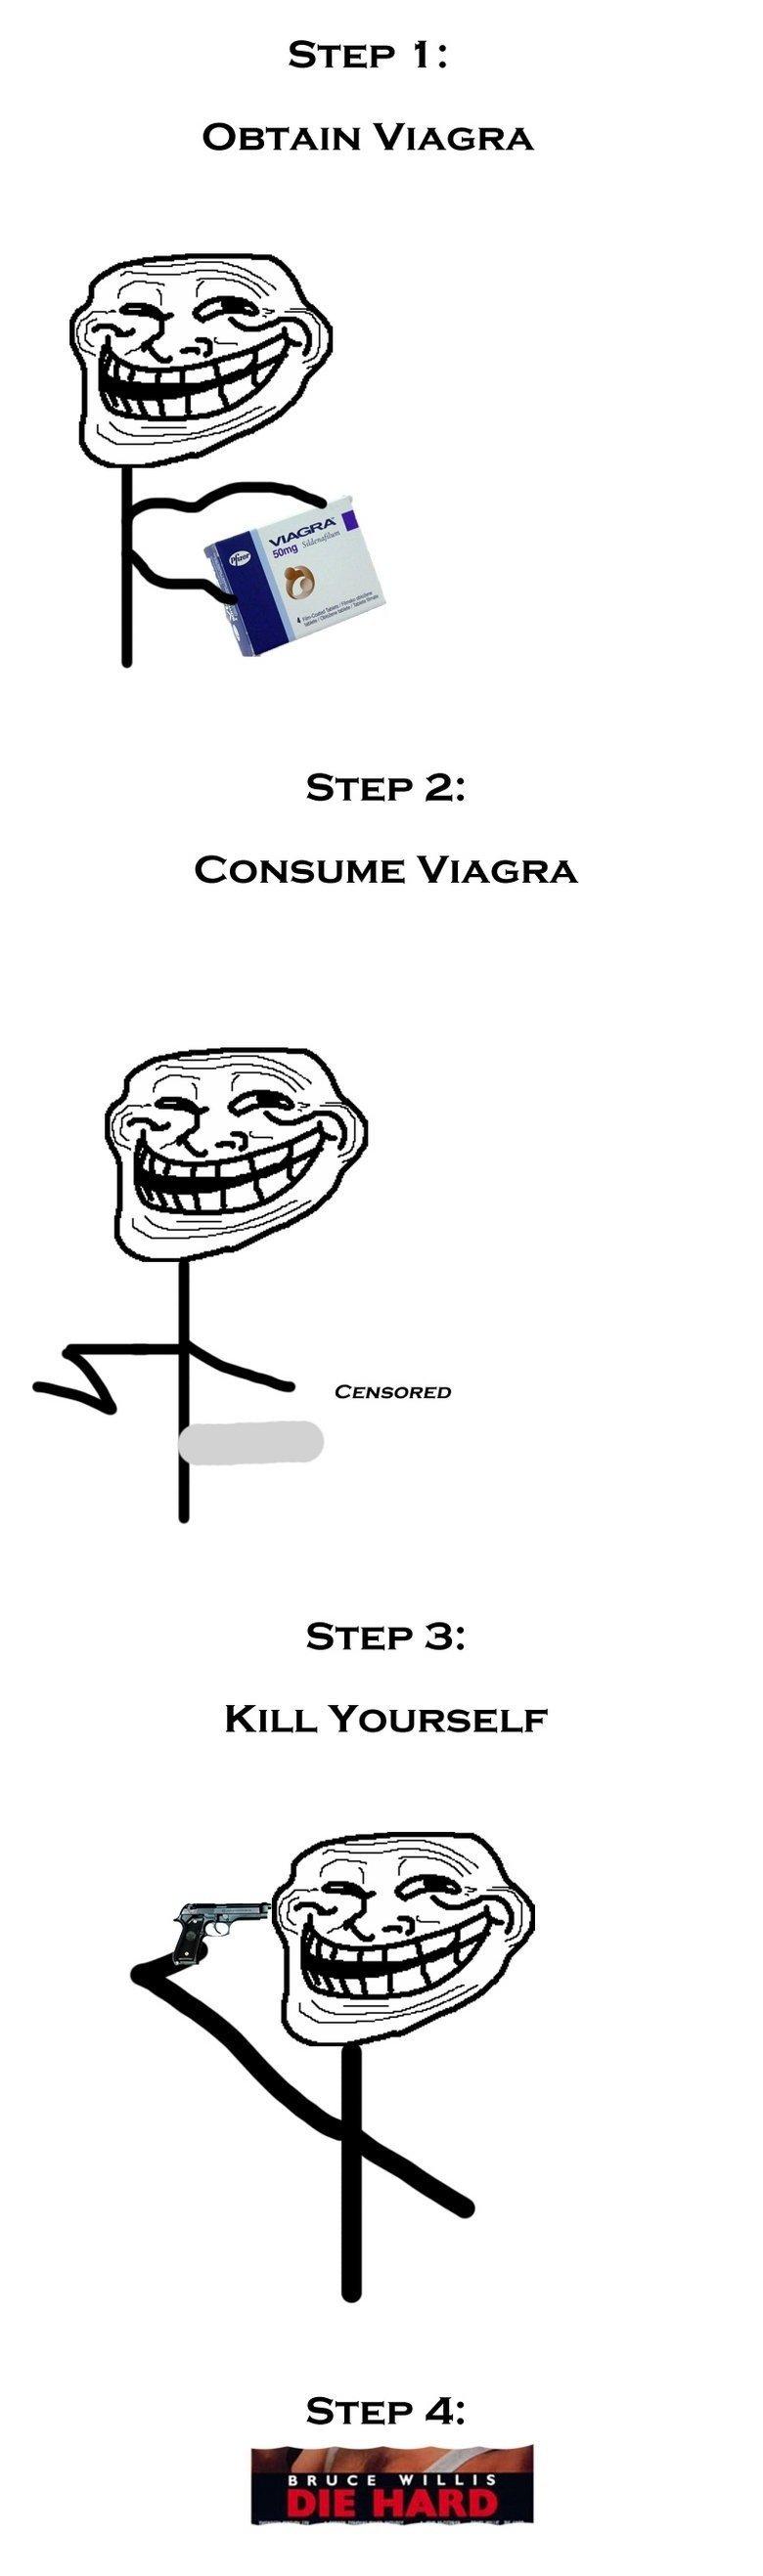 It Seems He Sunglasses .... . STEP 1 I OBTAIN VIAGRA STEP . CONSUME VIAGRA STEP B: KILL YOURSELF STEP a: BRUCE Mire.